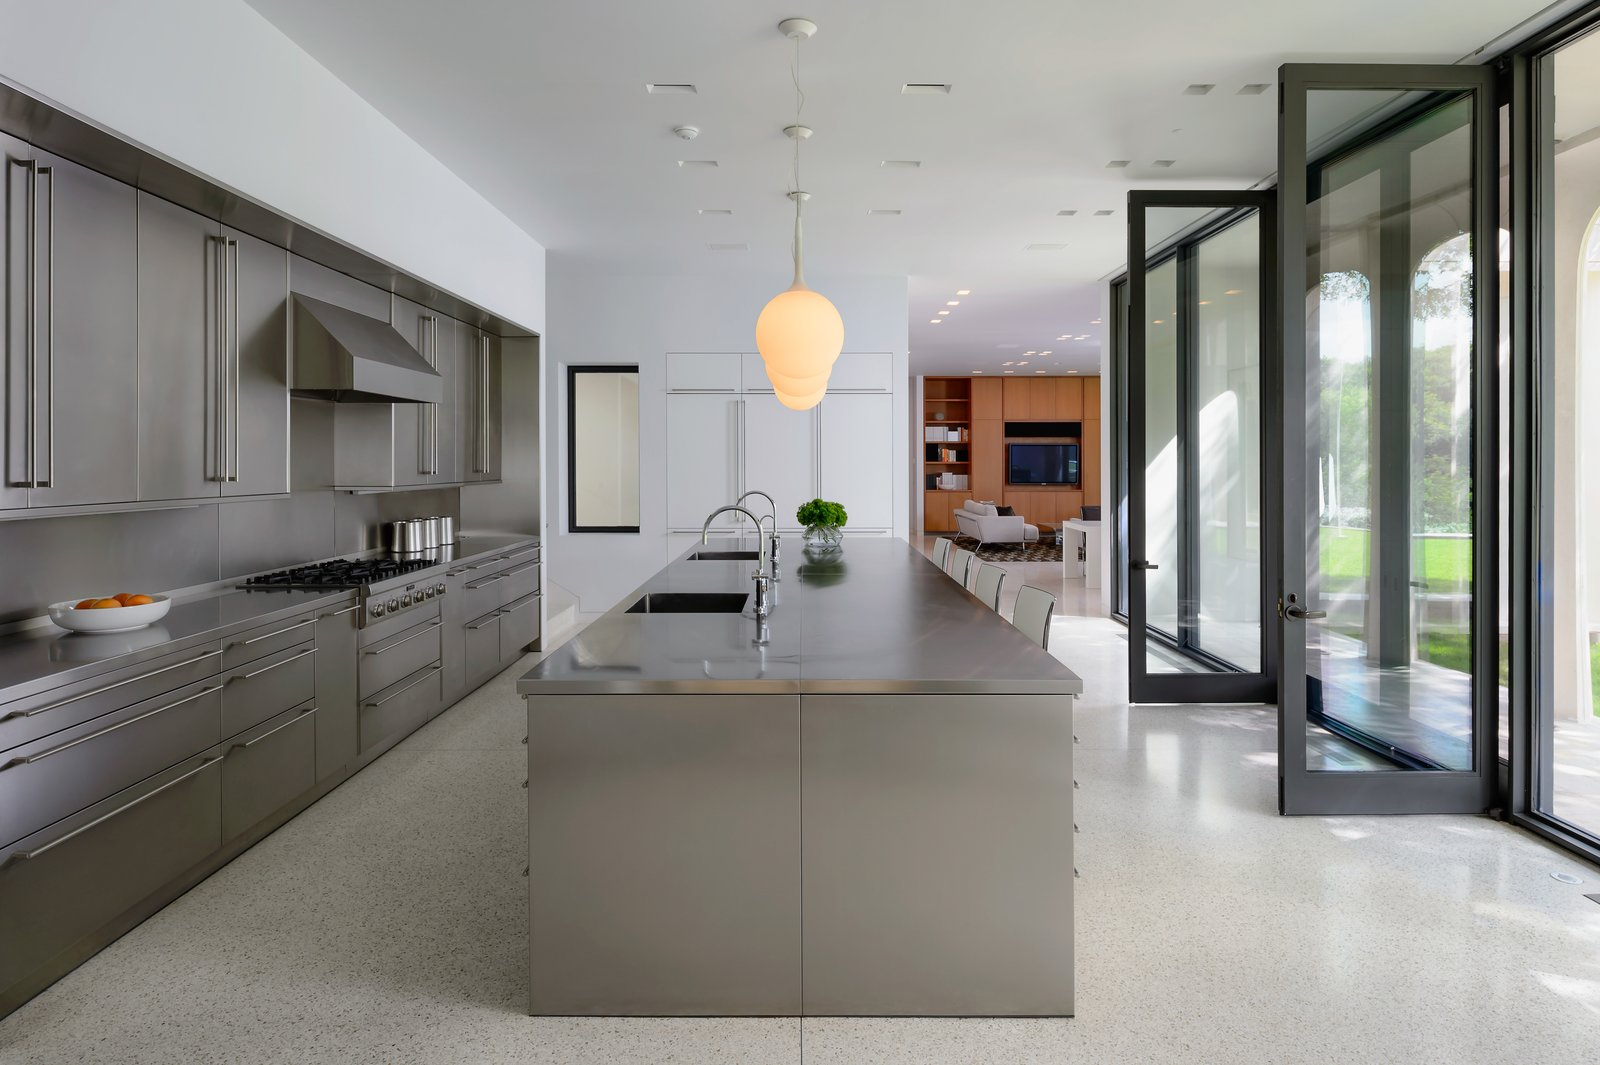 Philip Johnson Beck House kitchen